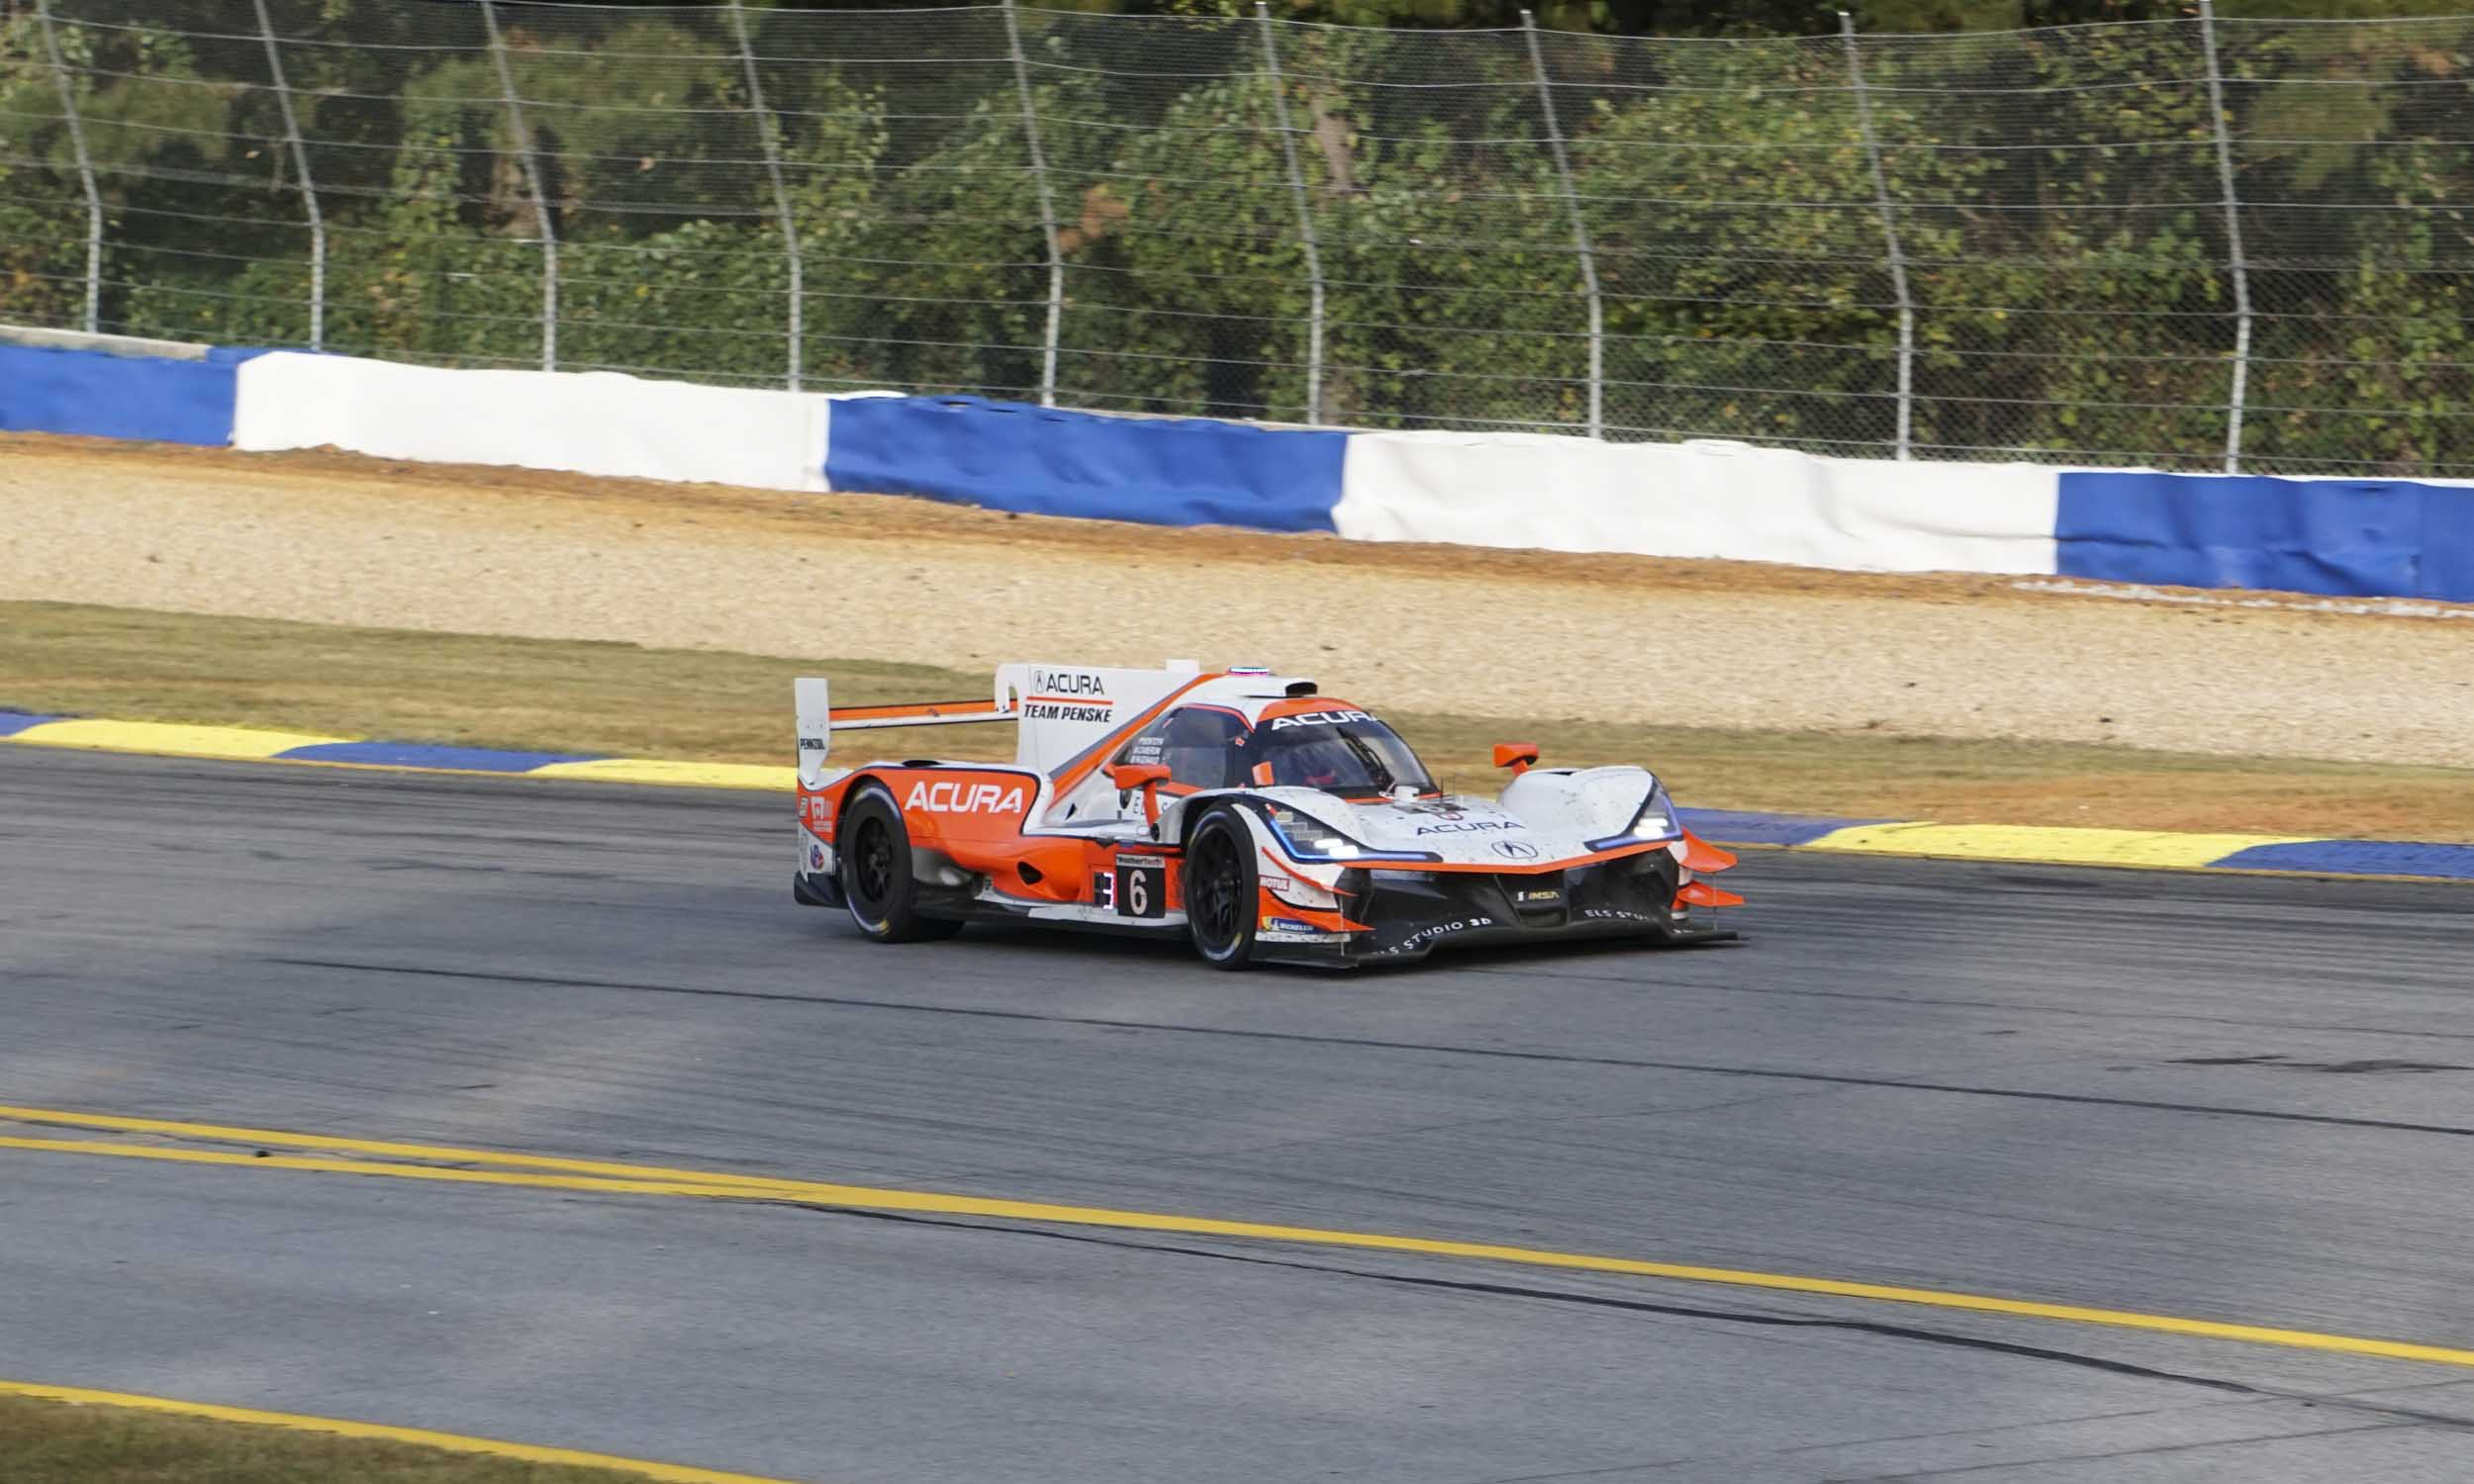 Gallery: 2019 Motul Petit Le Mans